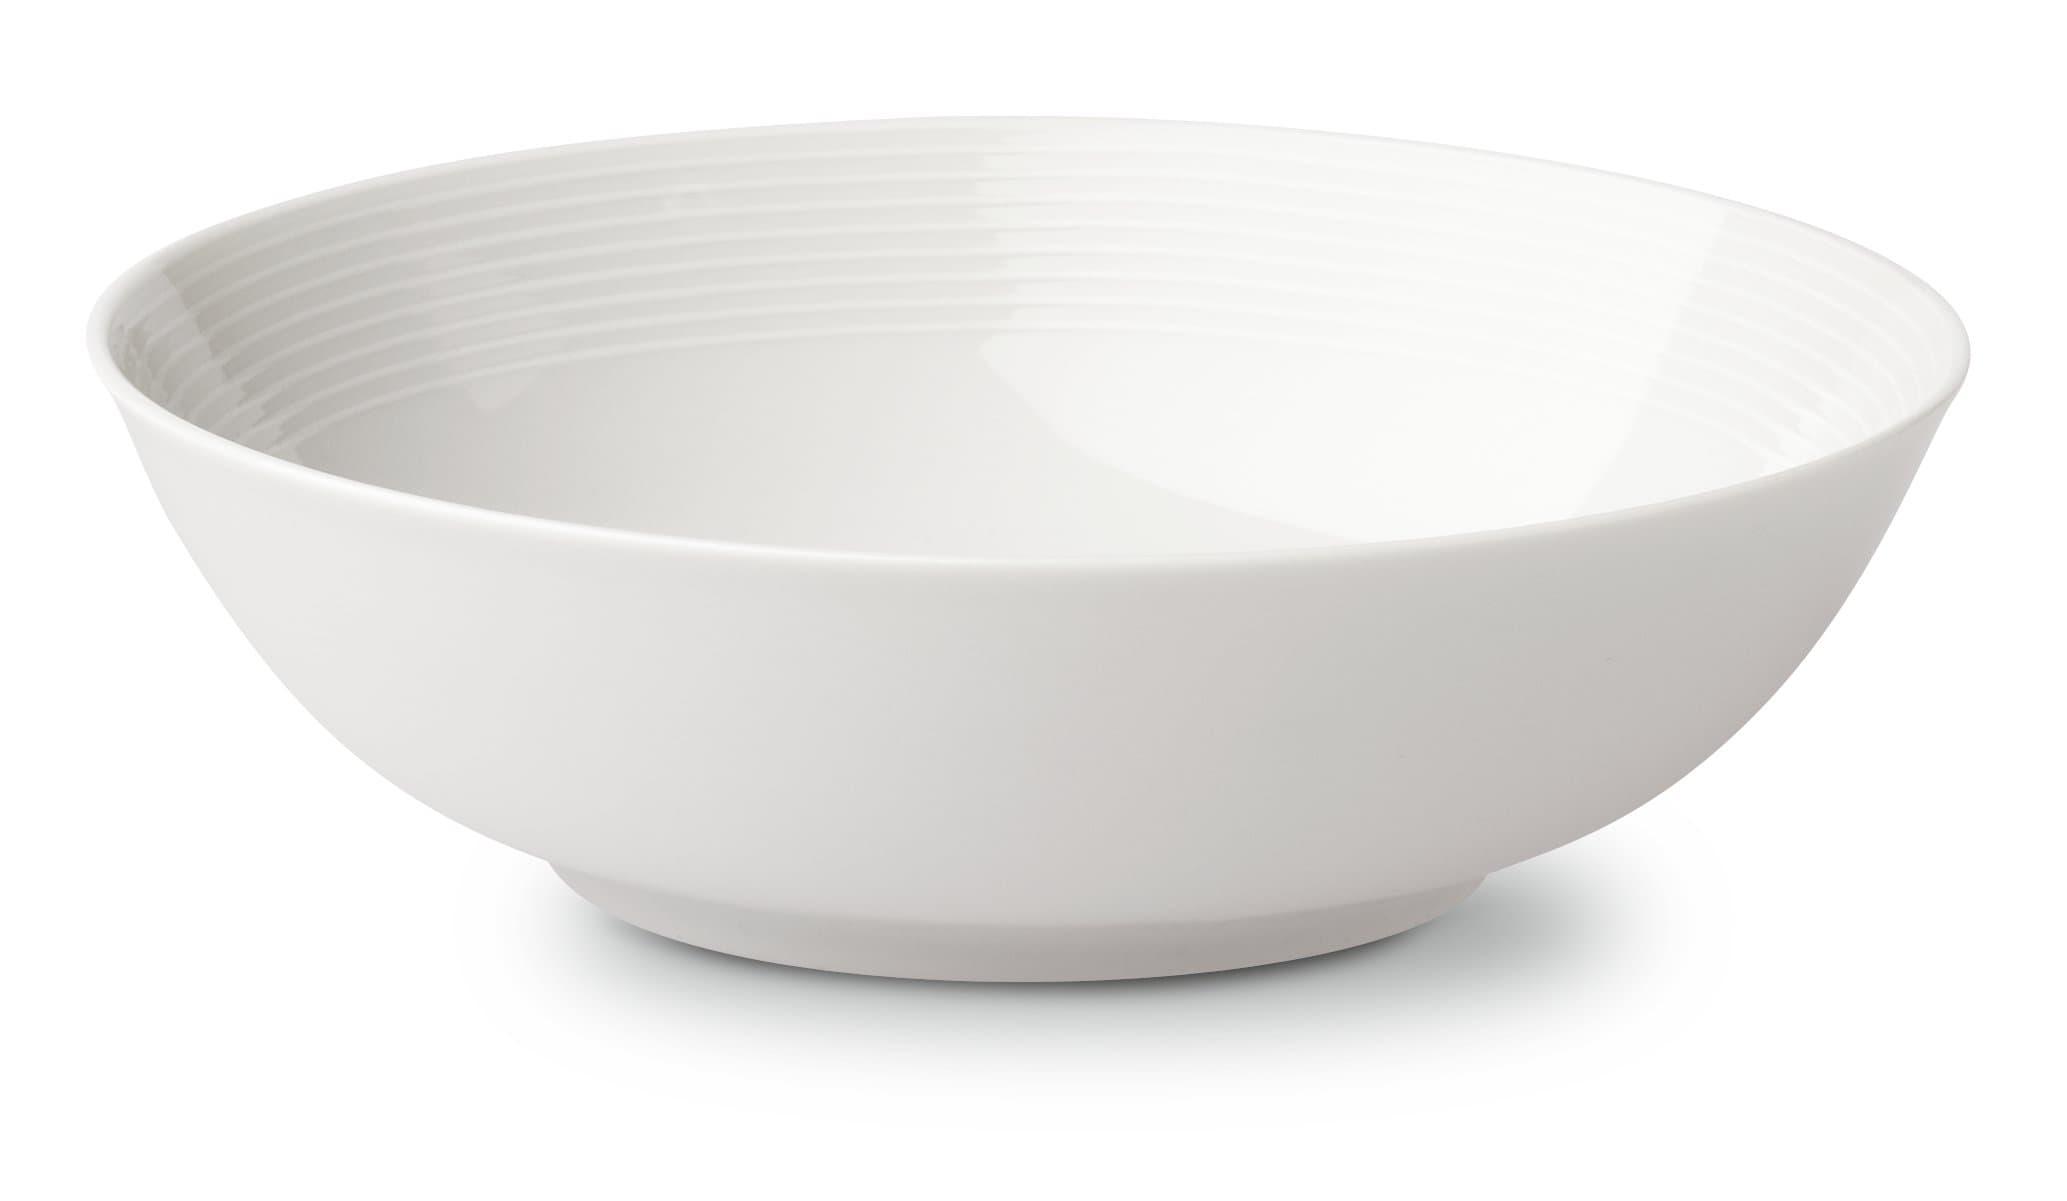 Cucina & Tavola VIENNA Bol